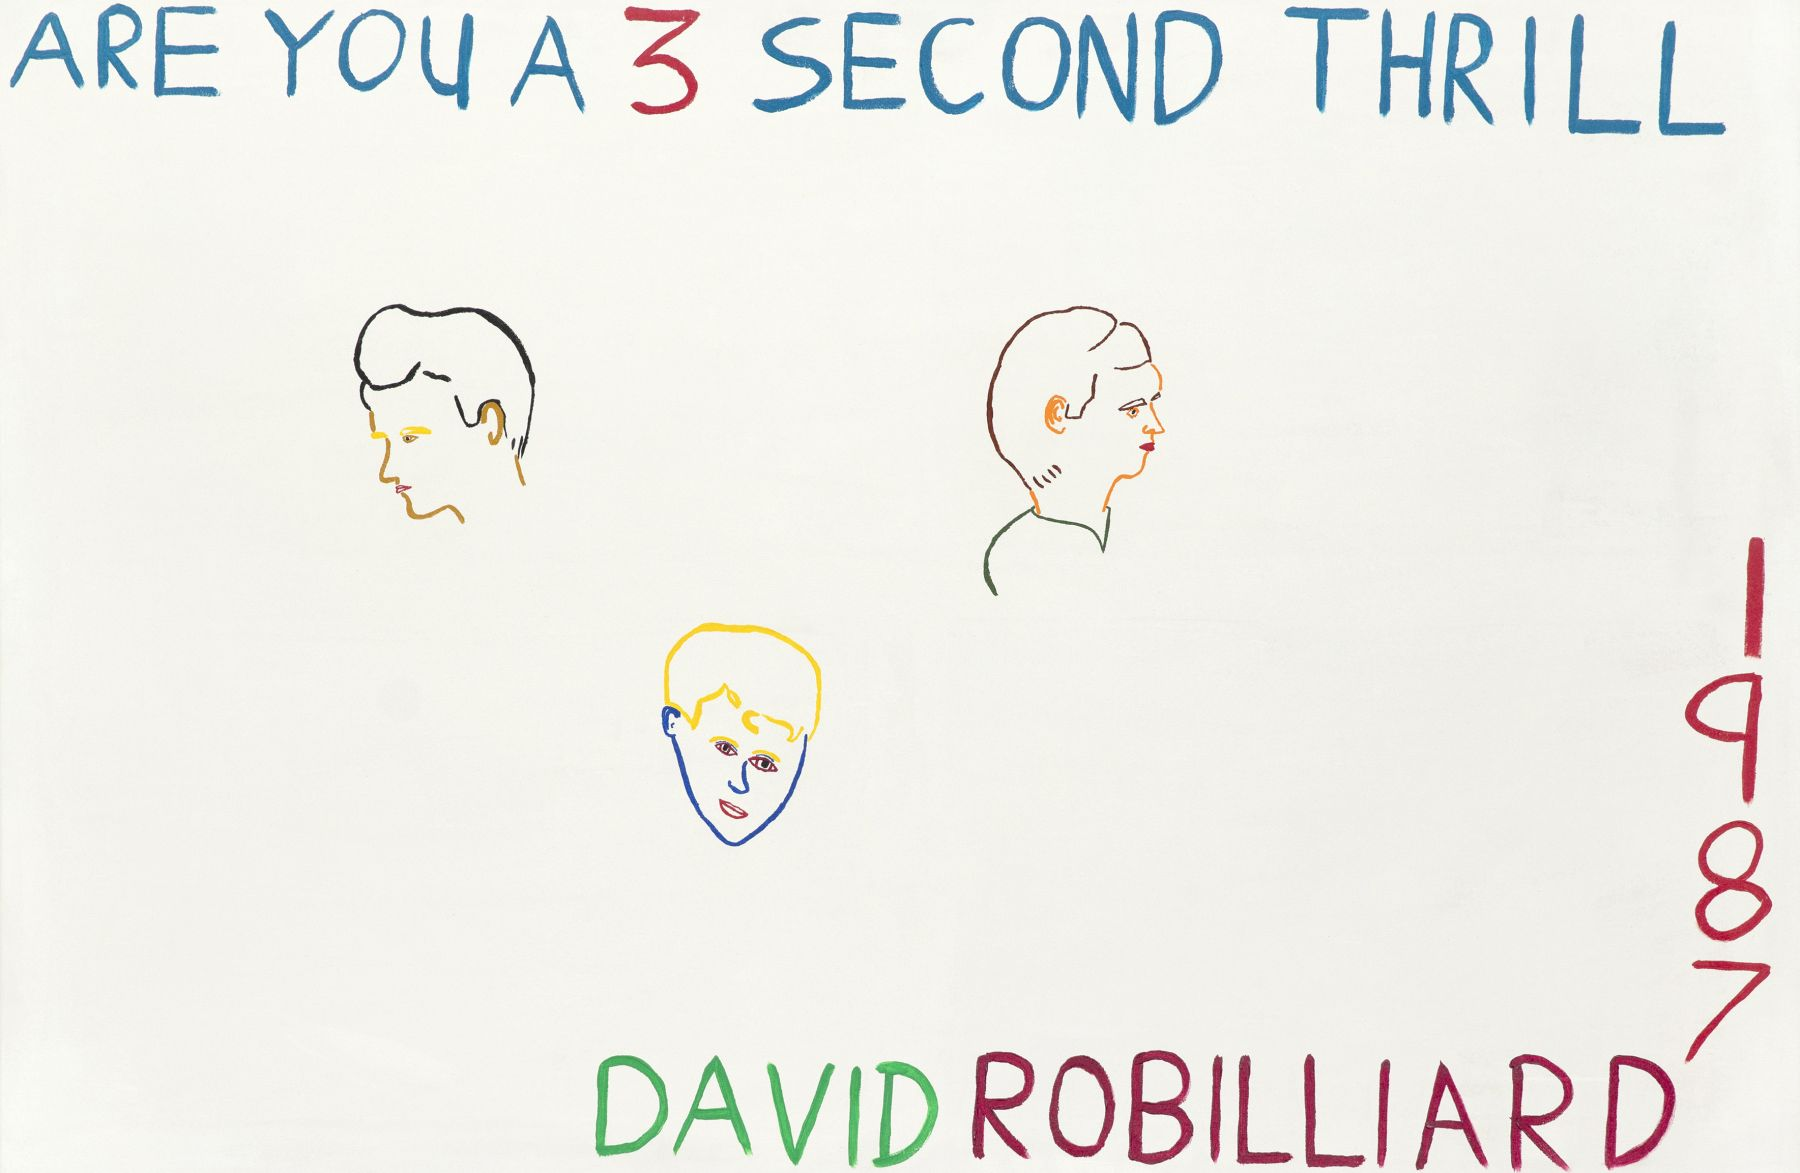 David Robilliard, Are You a 3 Second Thrill, 198